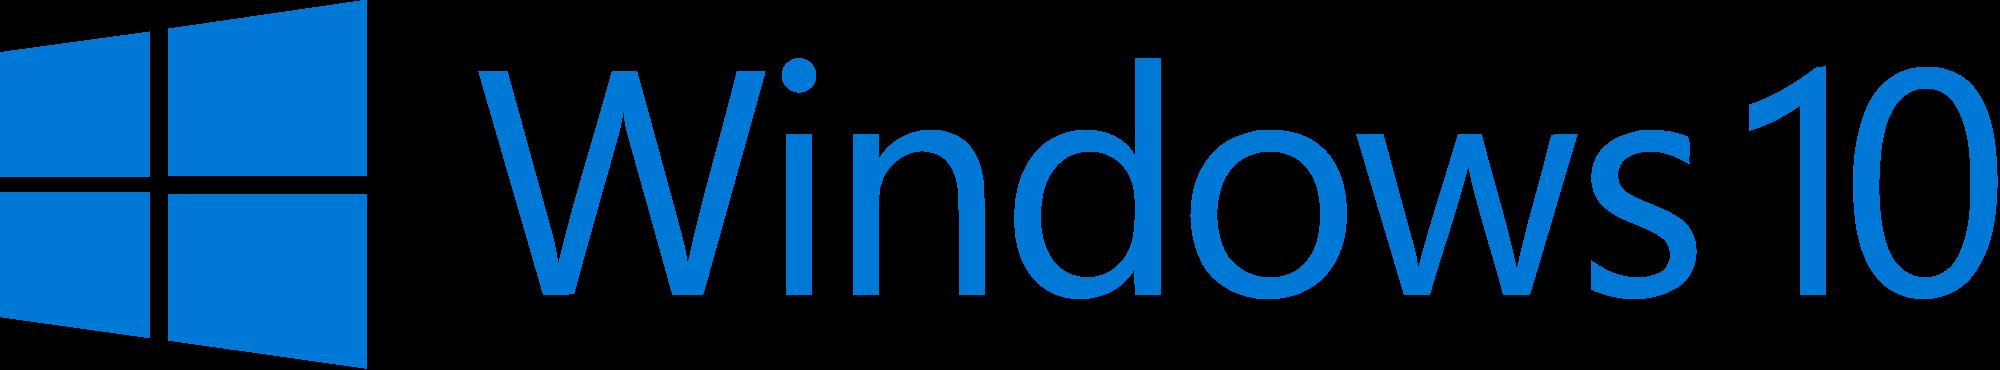 Microsoft Windows Logo PNG Transparent Microsoft Windows.